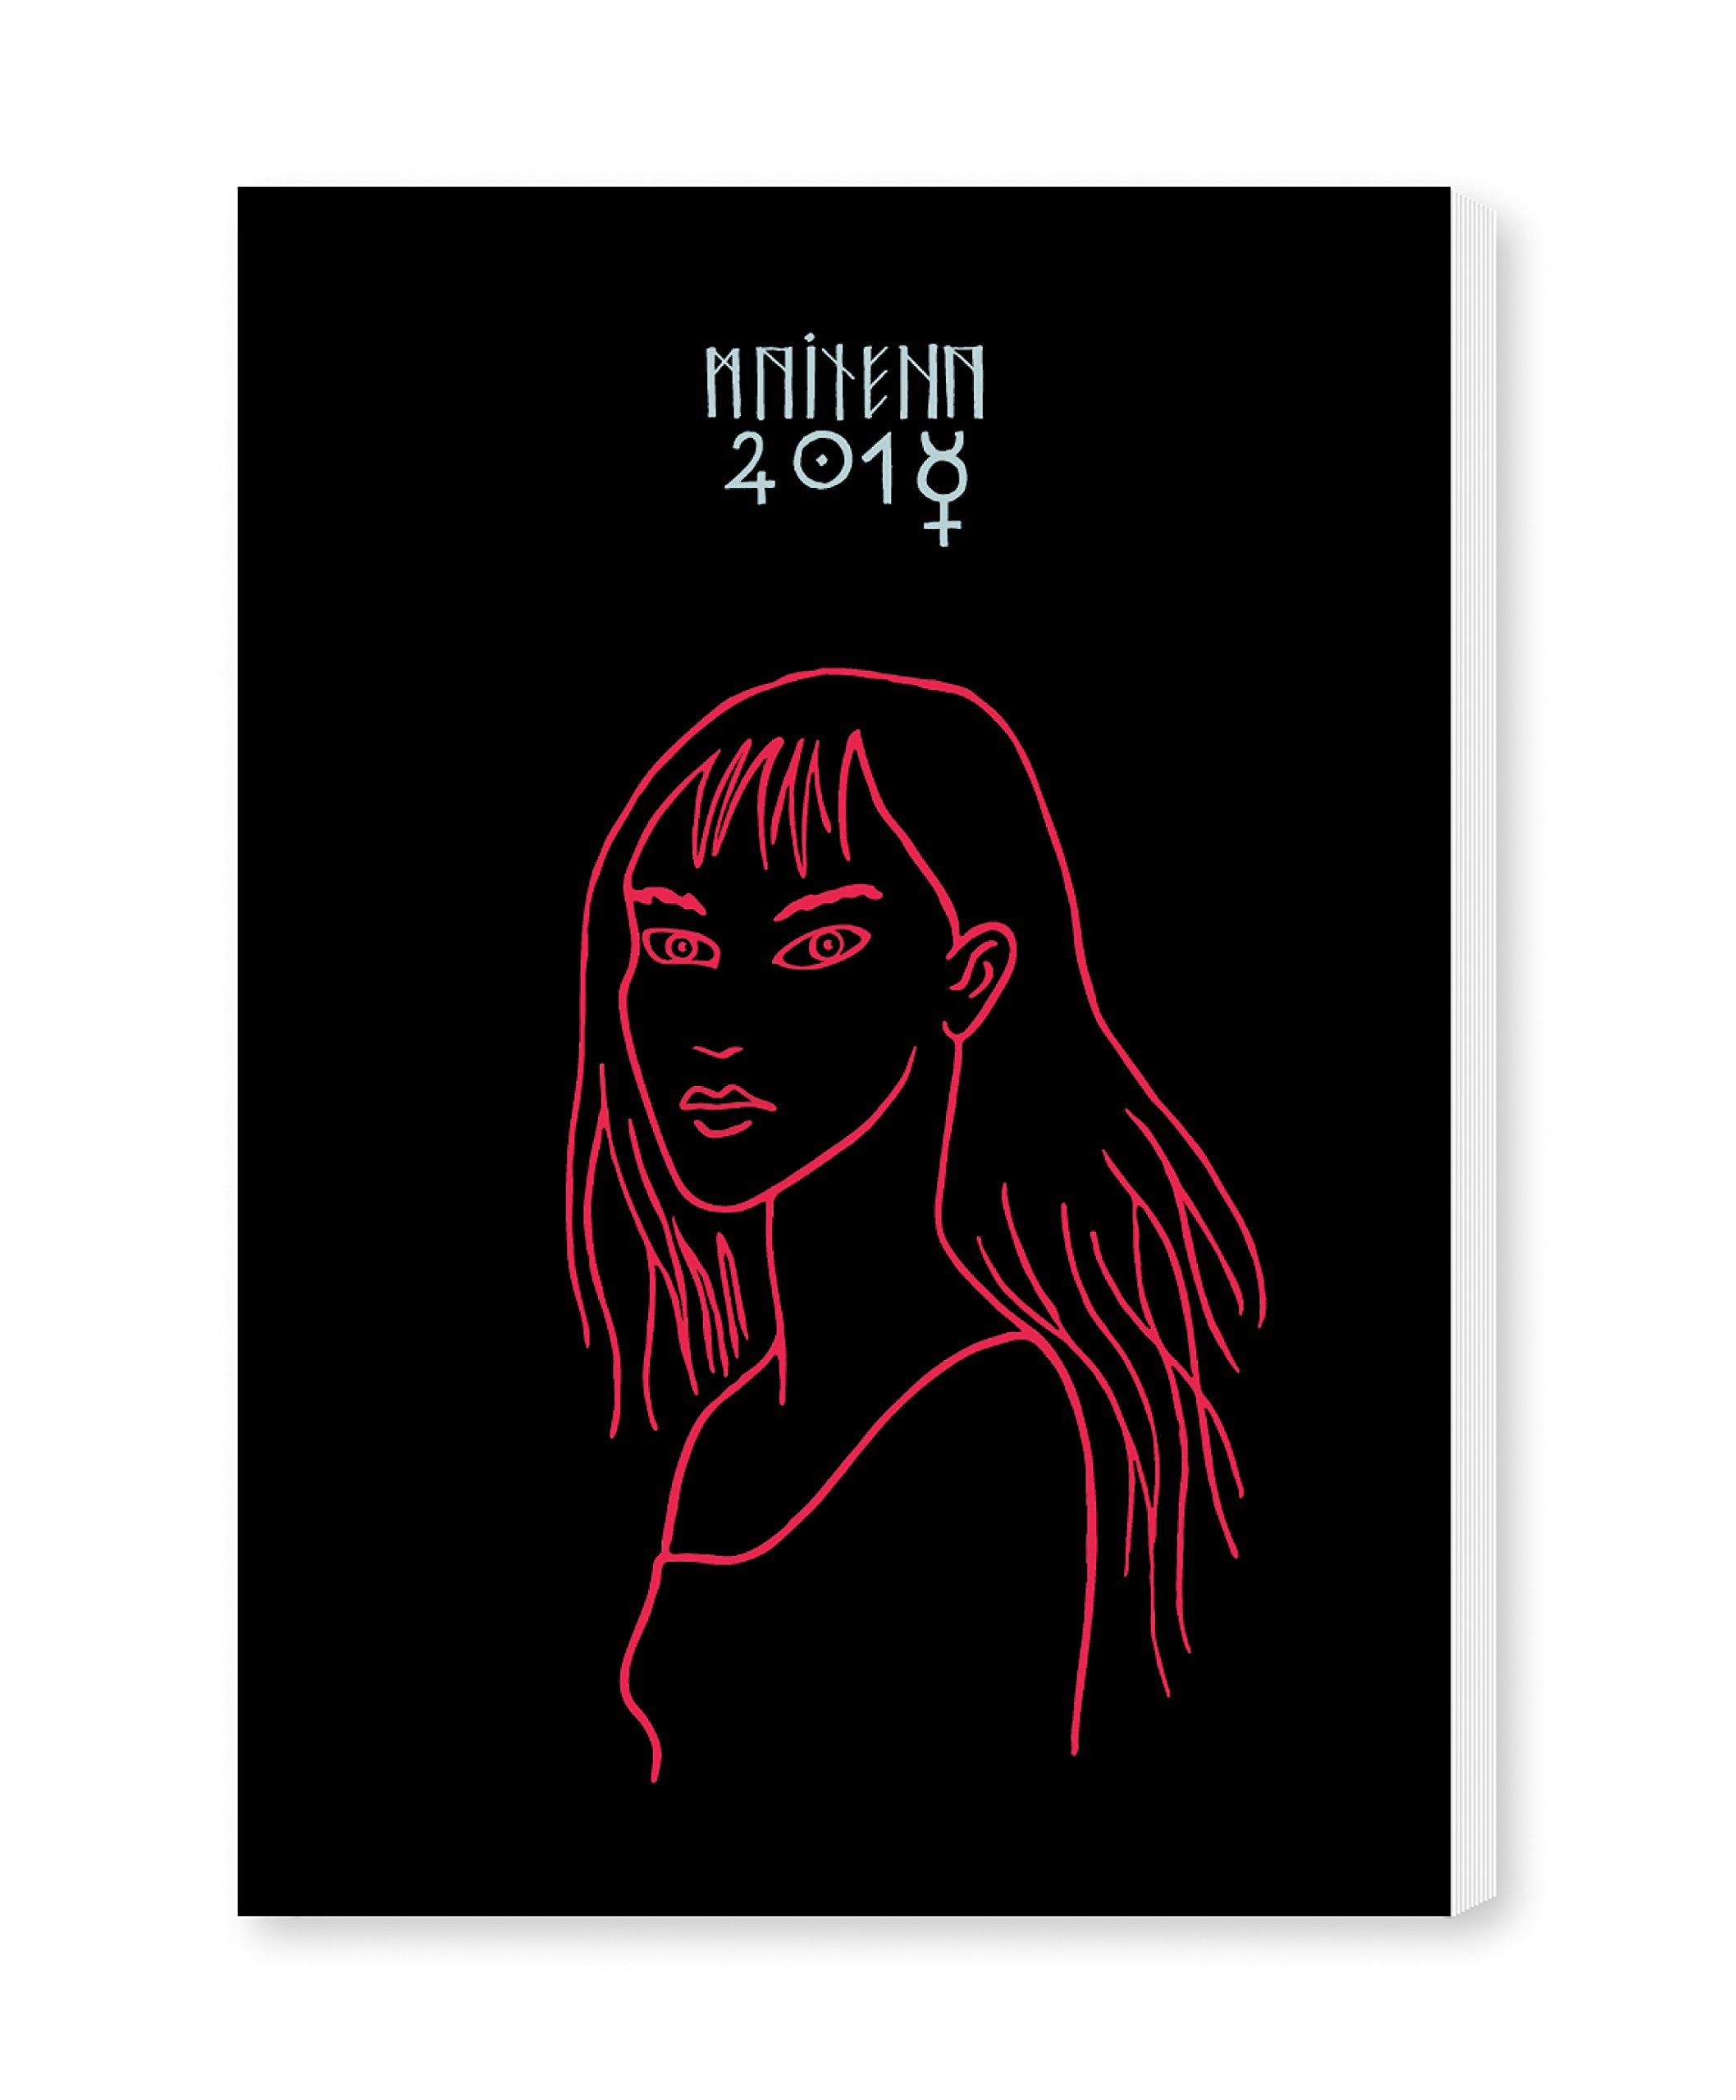 Maitena 2018 Agenda encuadernada - Bruja negra (Spanish ...